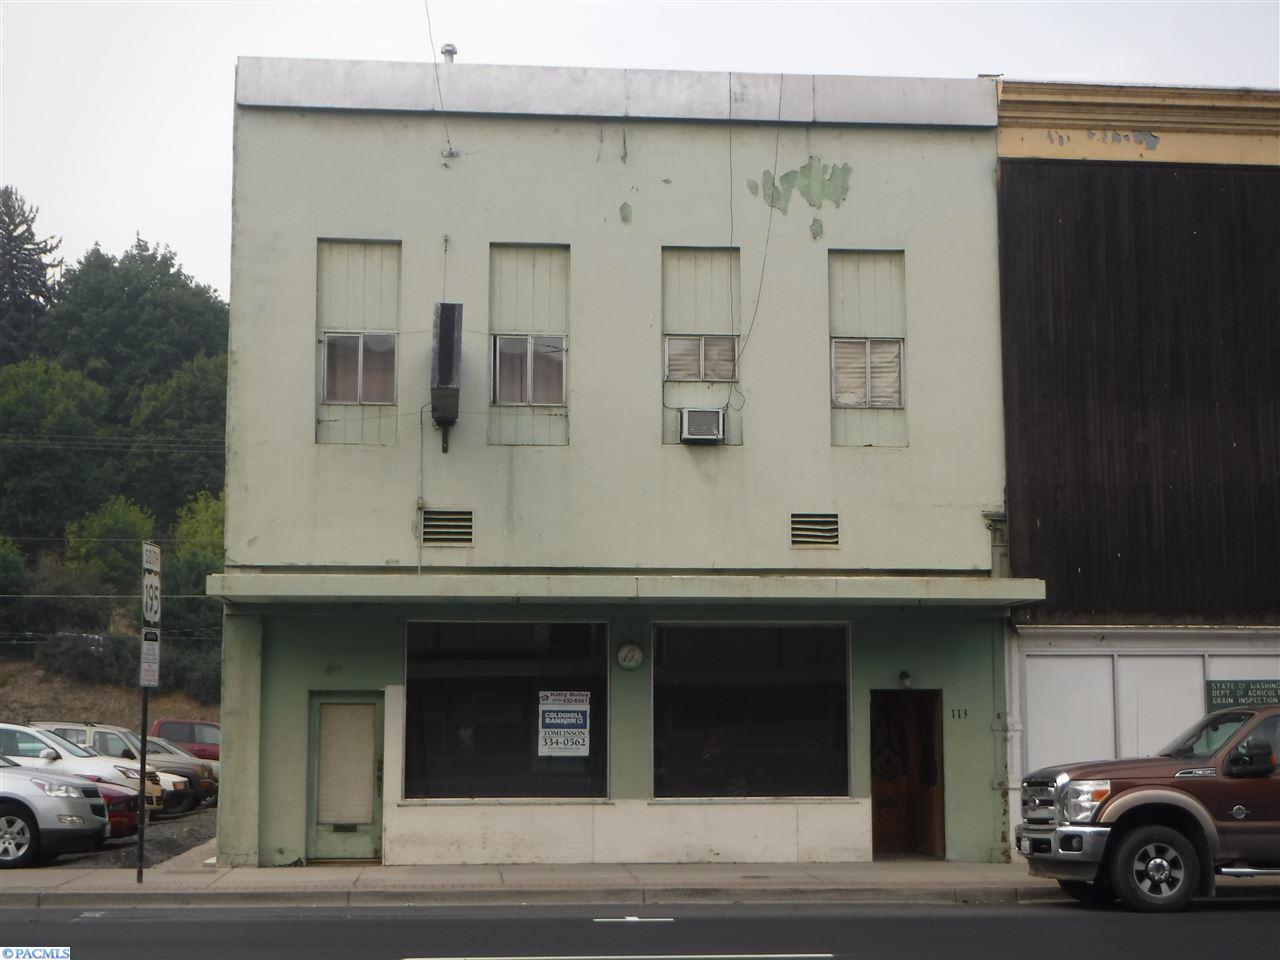 115 N Main St, Colfax, Washington 99111